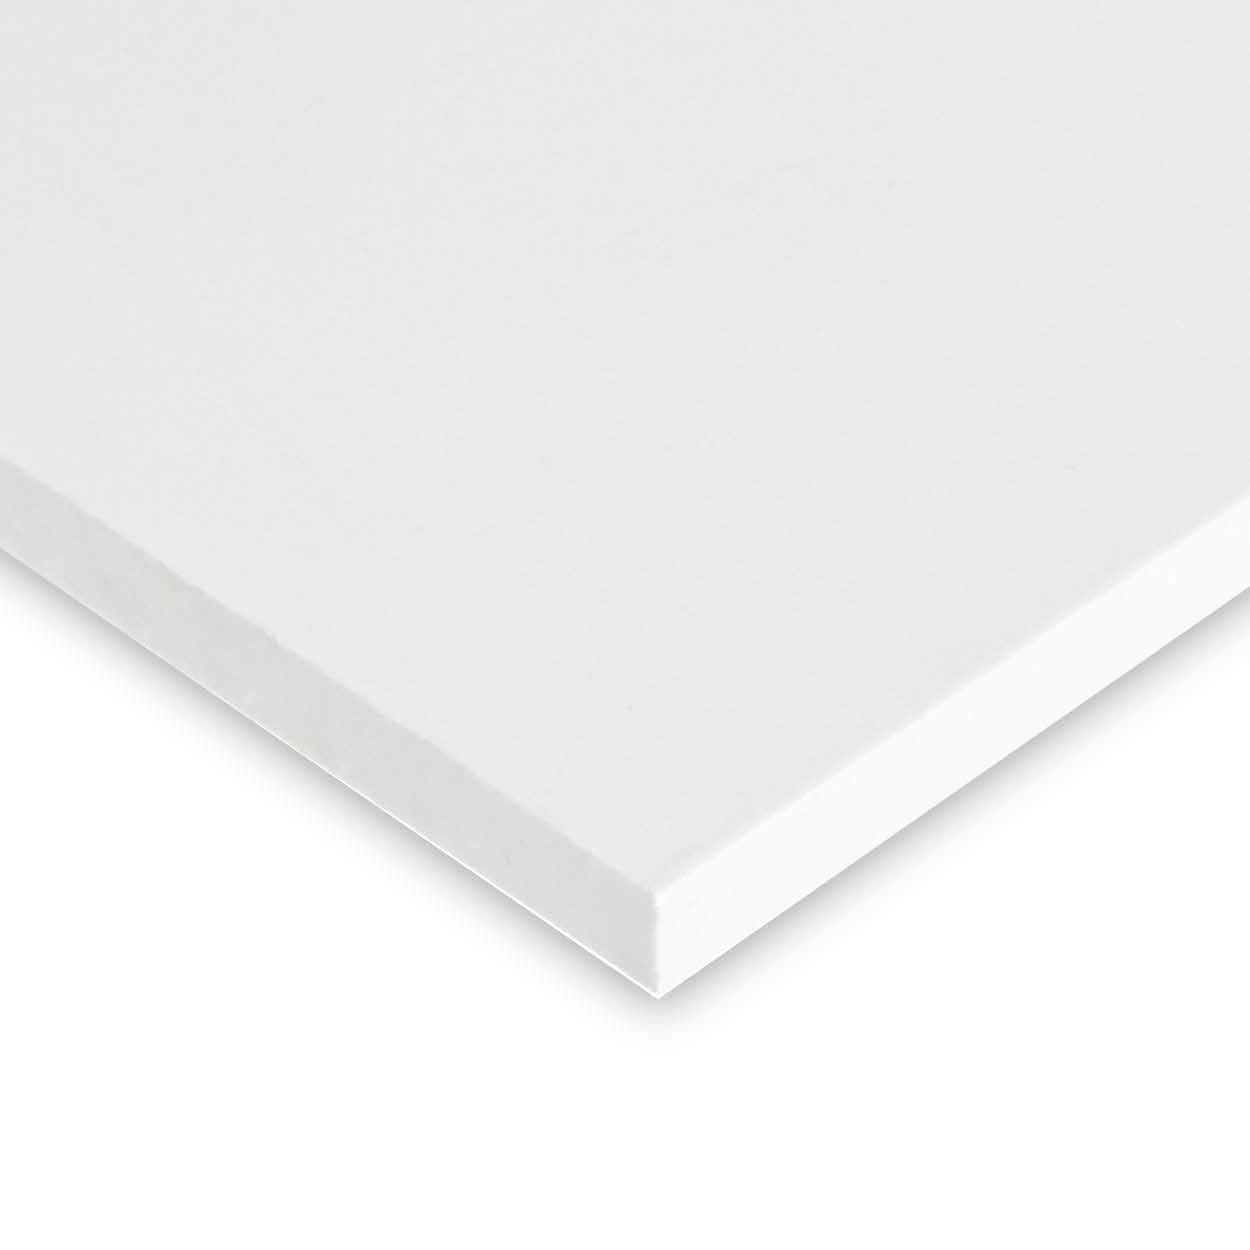 "PTFE Teflon Sheet .032"" x 1.5"" x 18"""